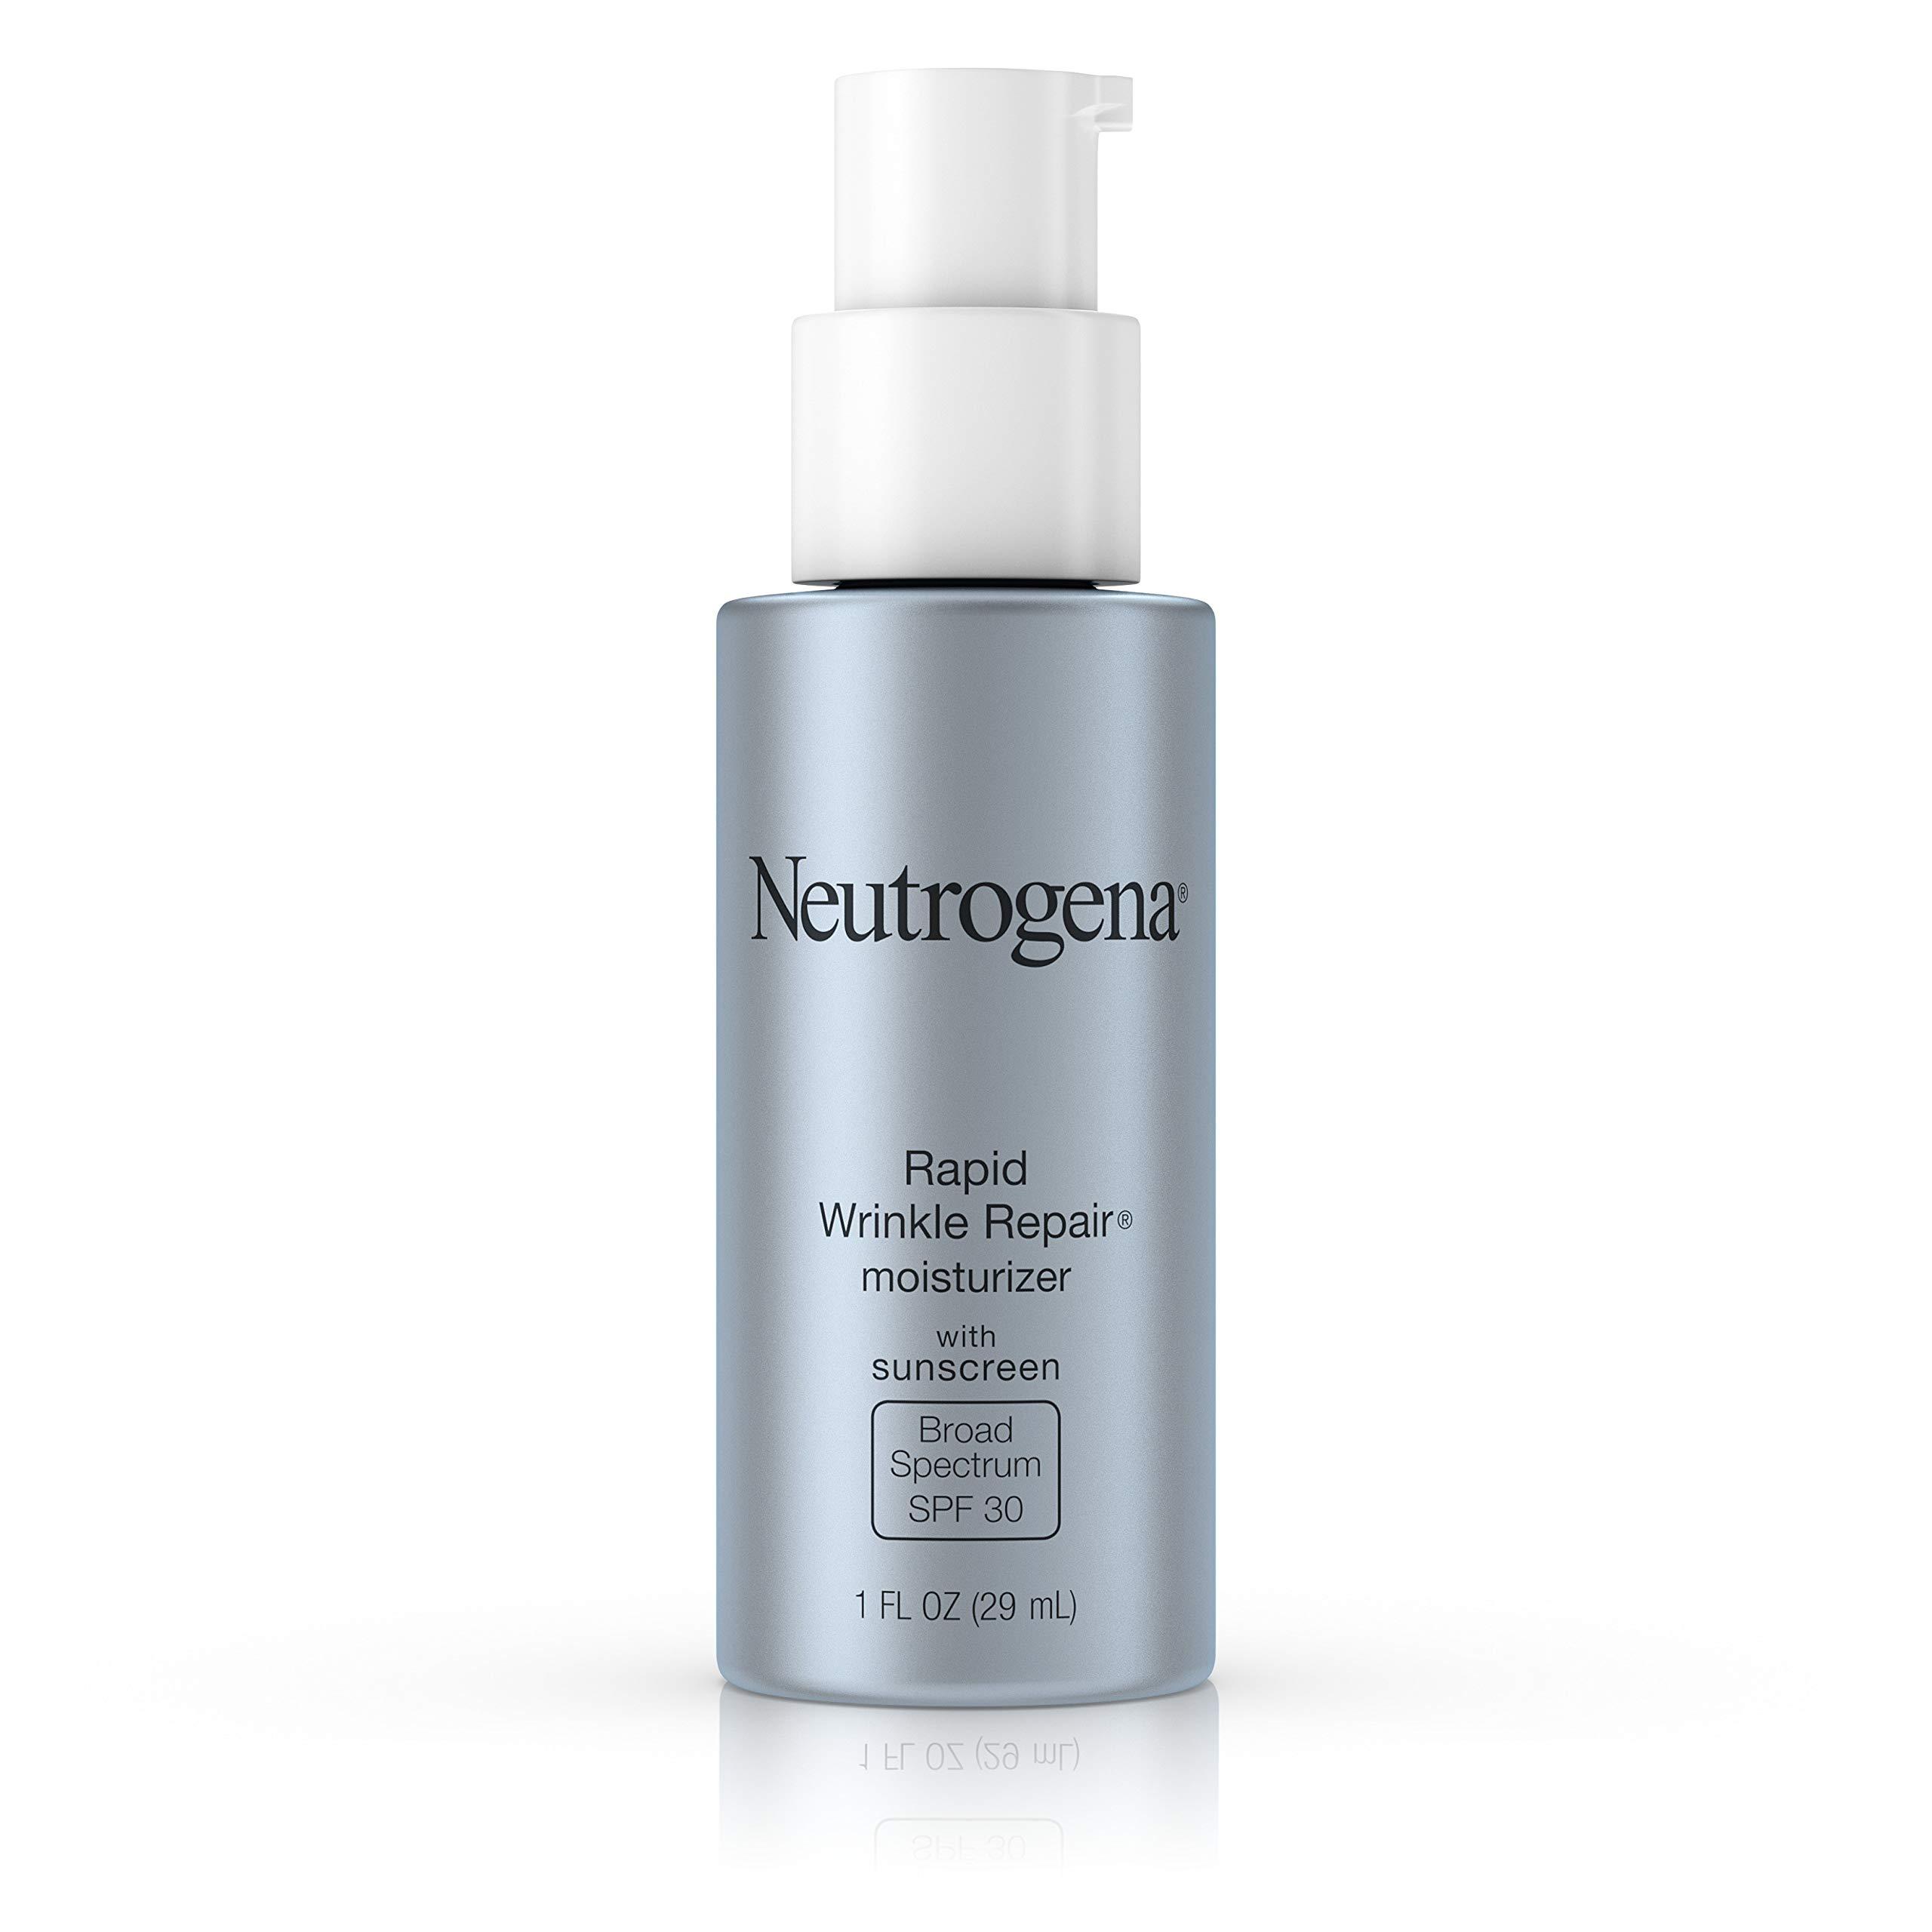 Neutrogena Rapid Wrinkle Repair Daily Retinol Anti-Wrinkle Moisturizer, Anti-Wrinkle Face & Neck Retinol Cream with Hyaluronic Acid, Retinol & Glycerin with SPF 30 Sunscreen, 1 fl. oz